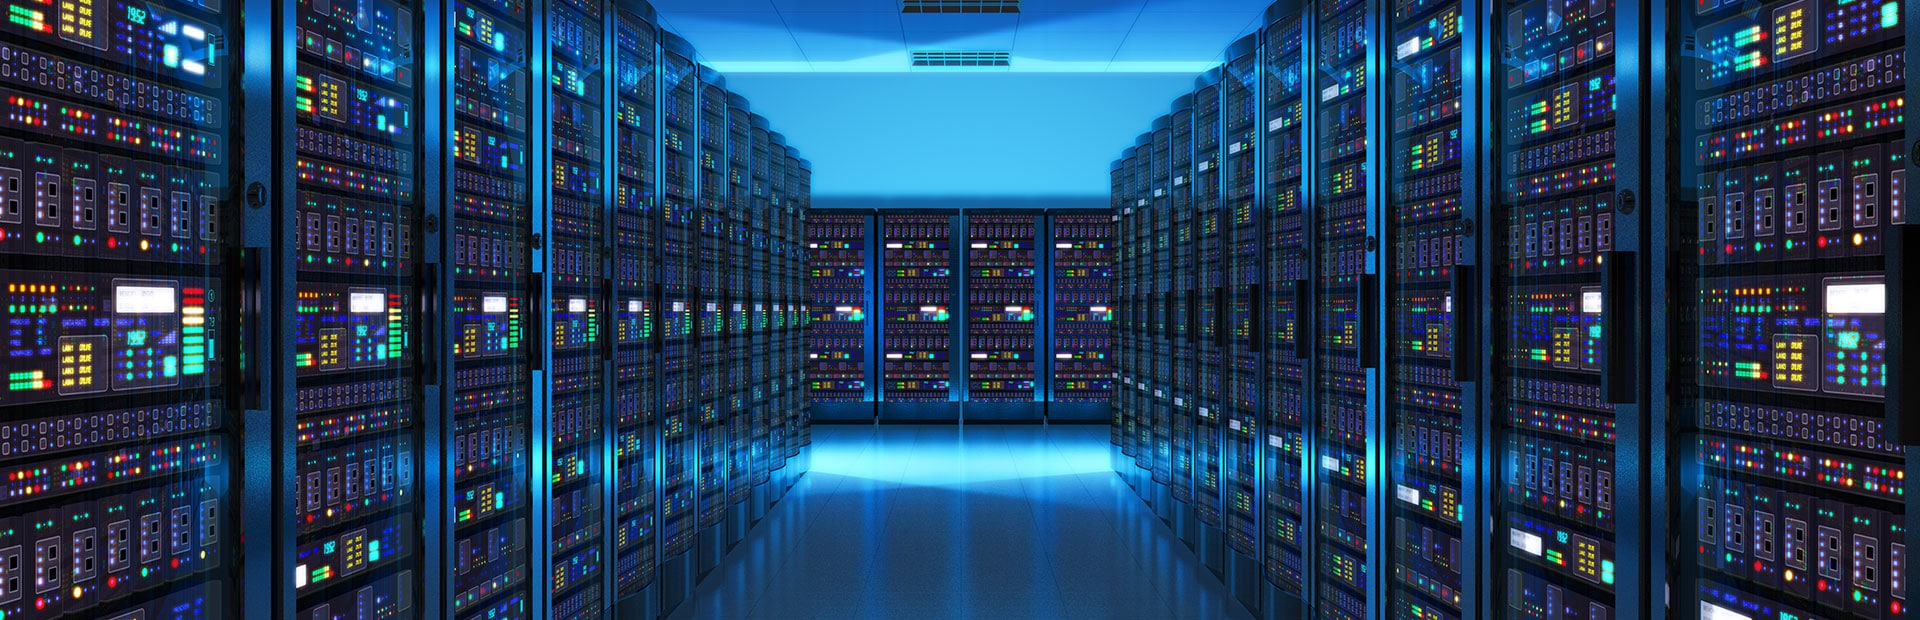 Big Data Management Servers